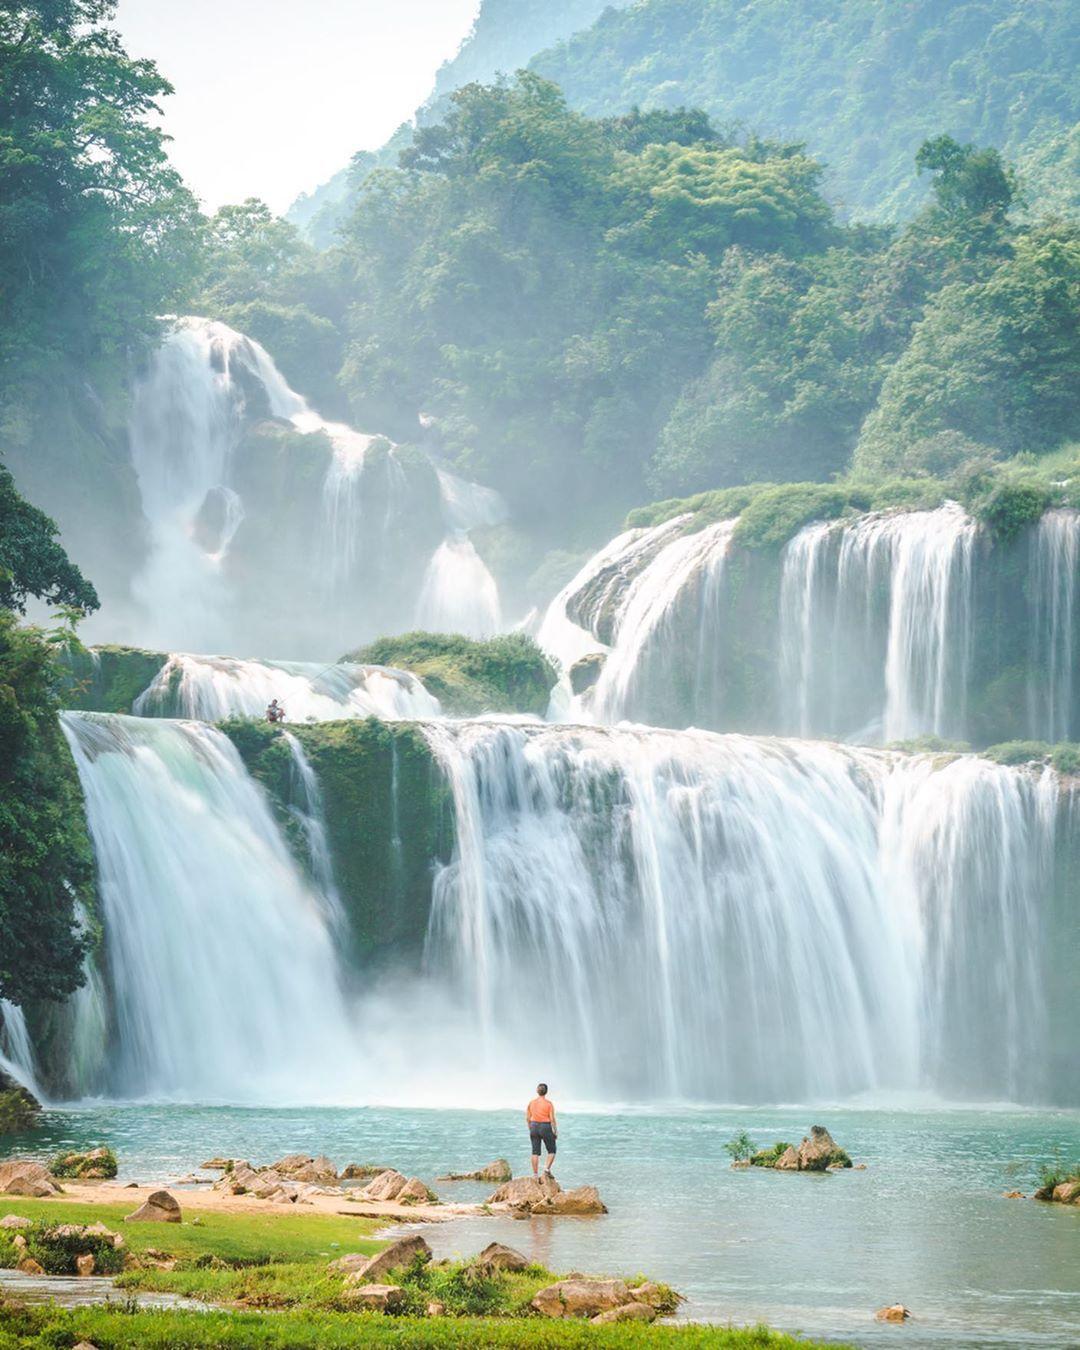 vietnam waterfalls - ban gioc waterfall 1